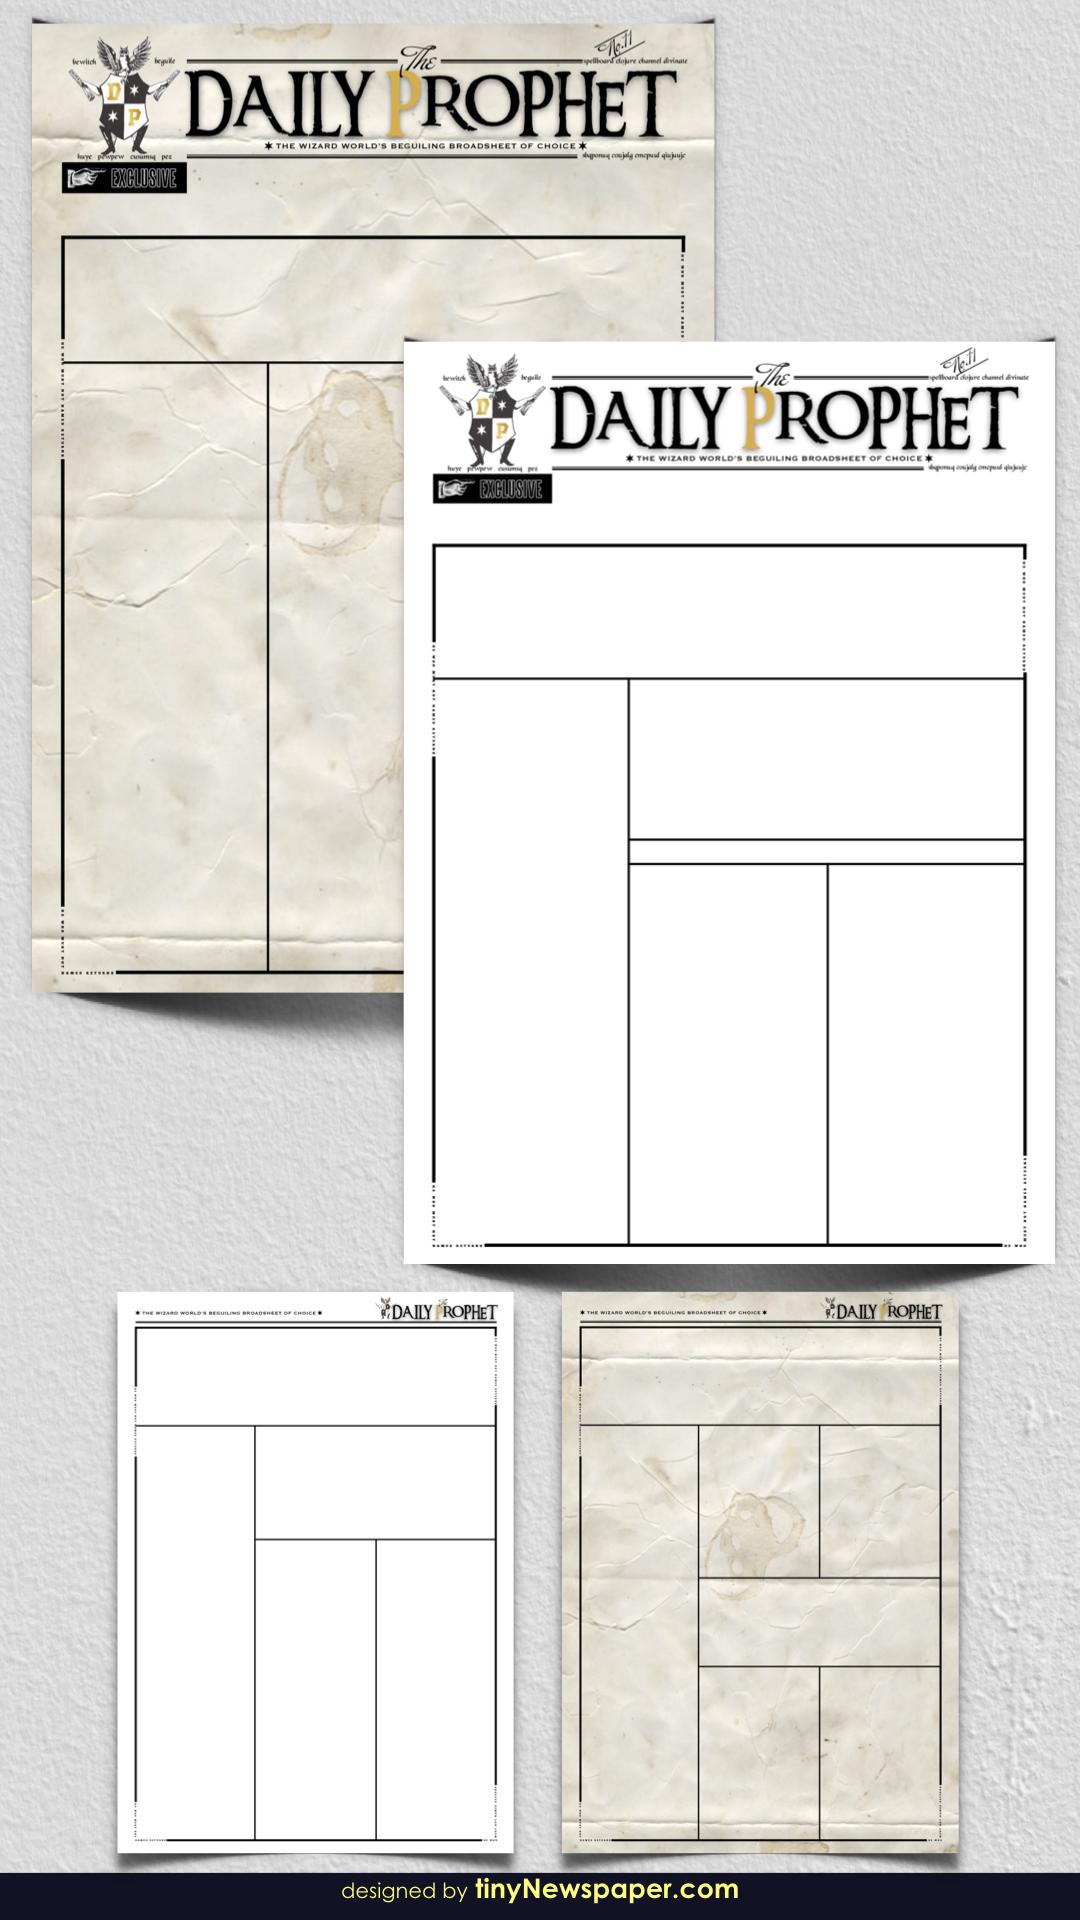 Harry Potter Daily Prophet Newspaper | Newspaper Google Docs